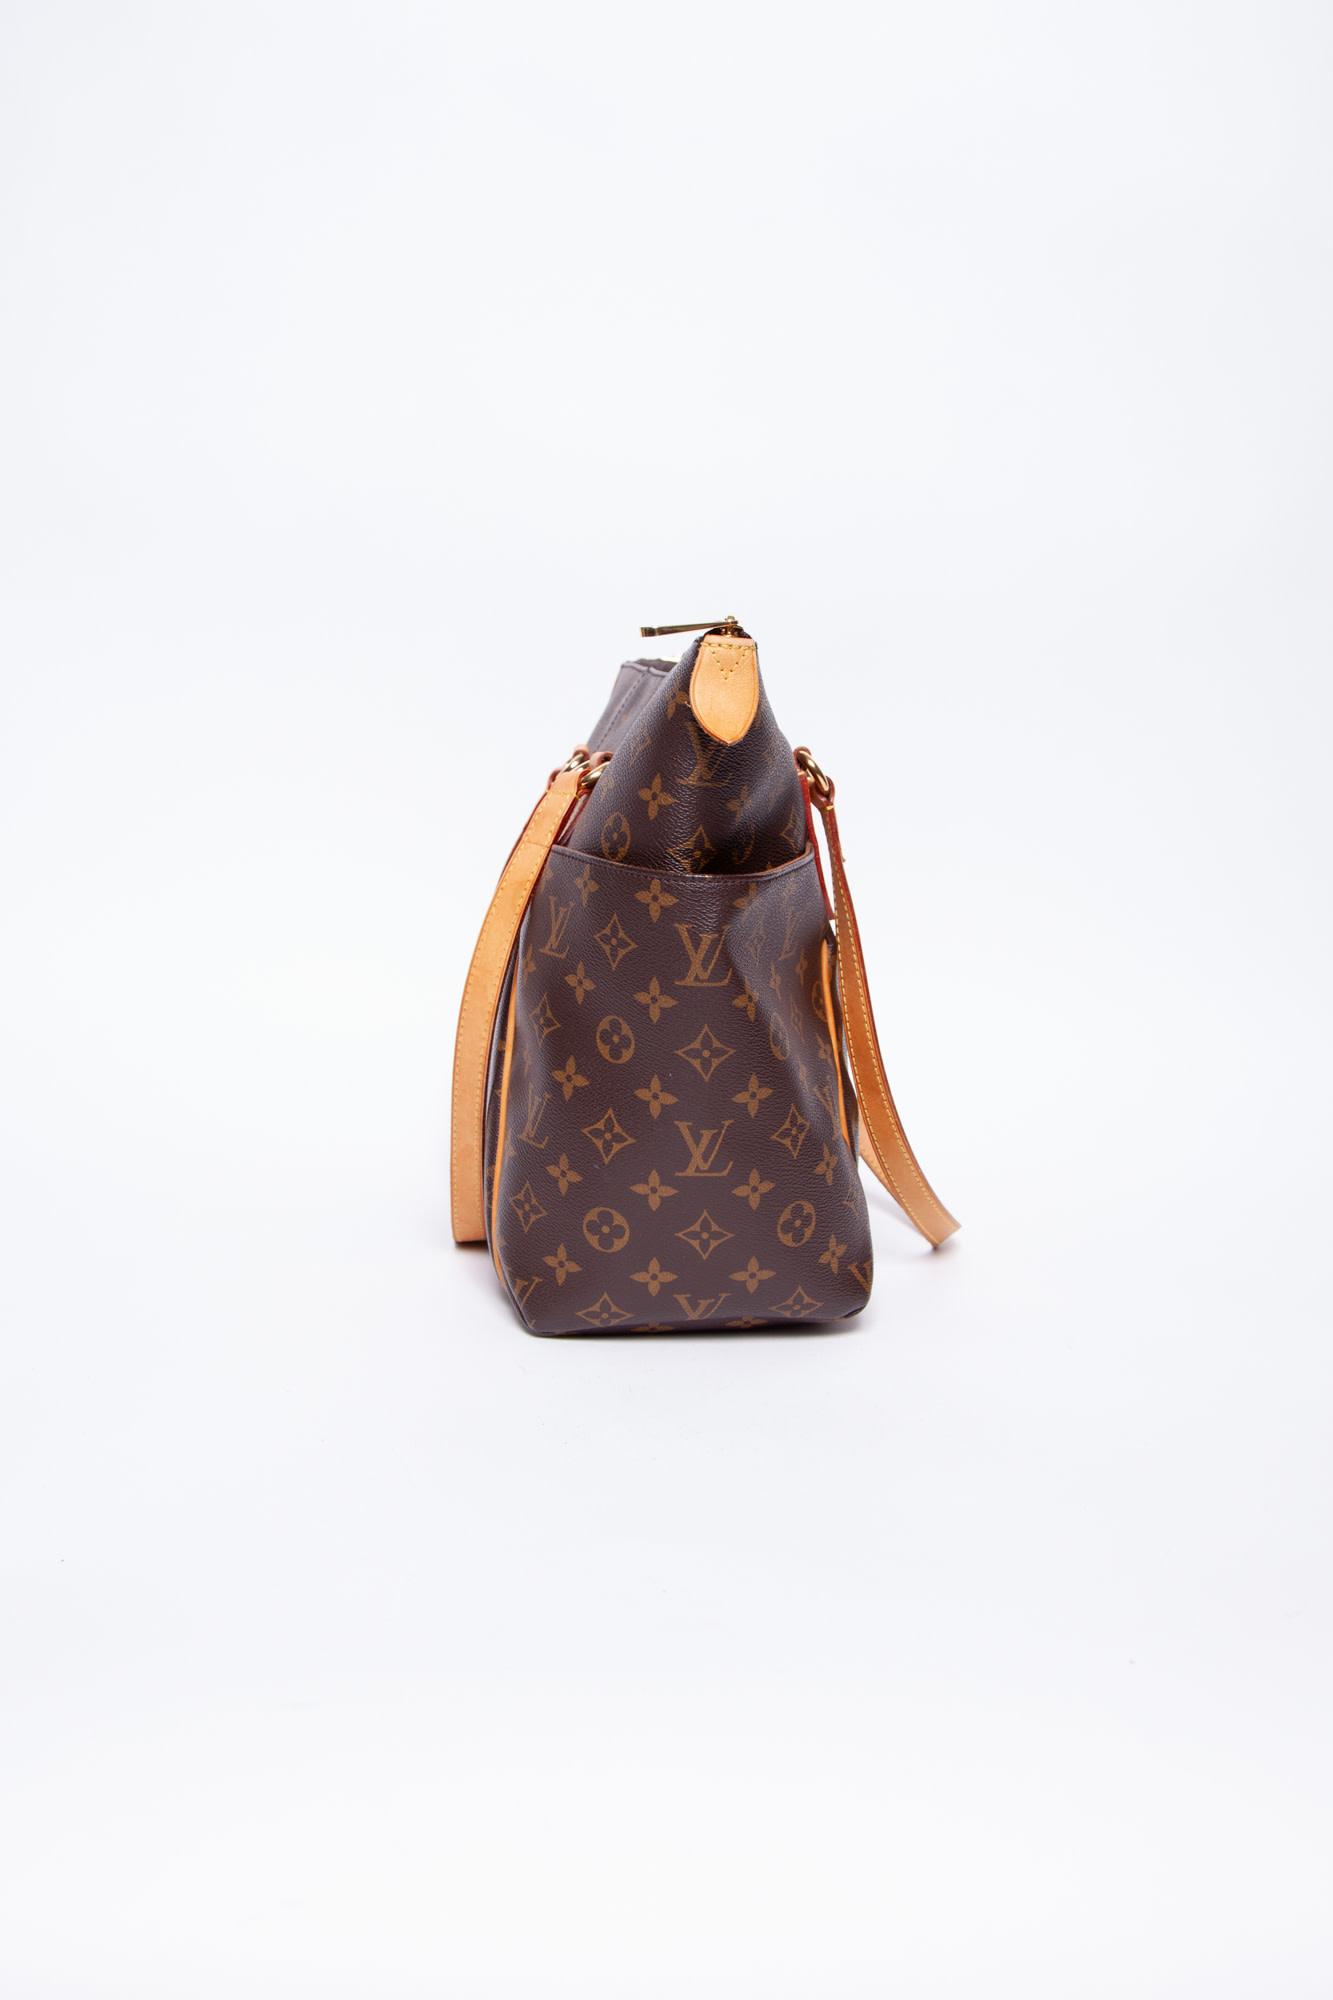 Louis Vuitton TOTALLY MM MONOGRAM BAG